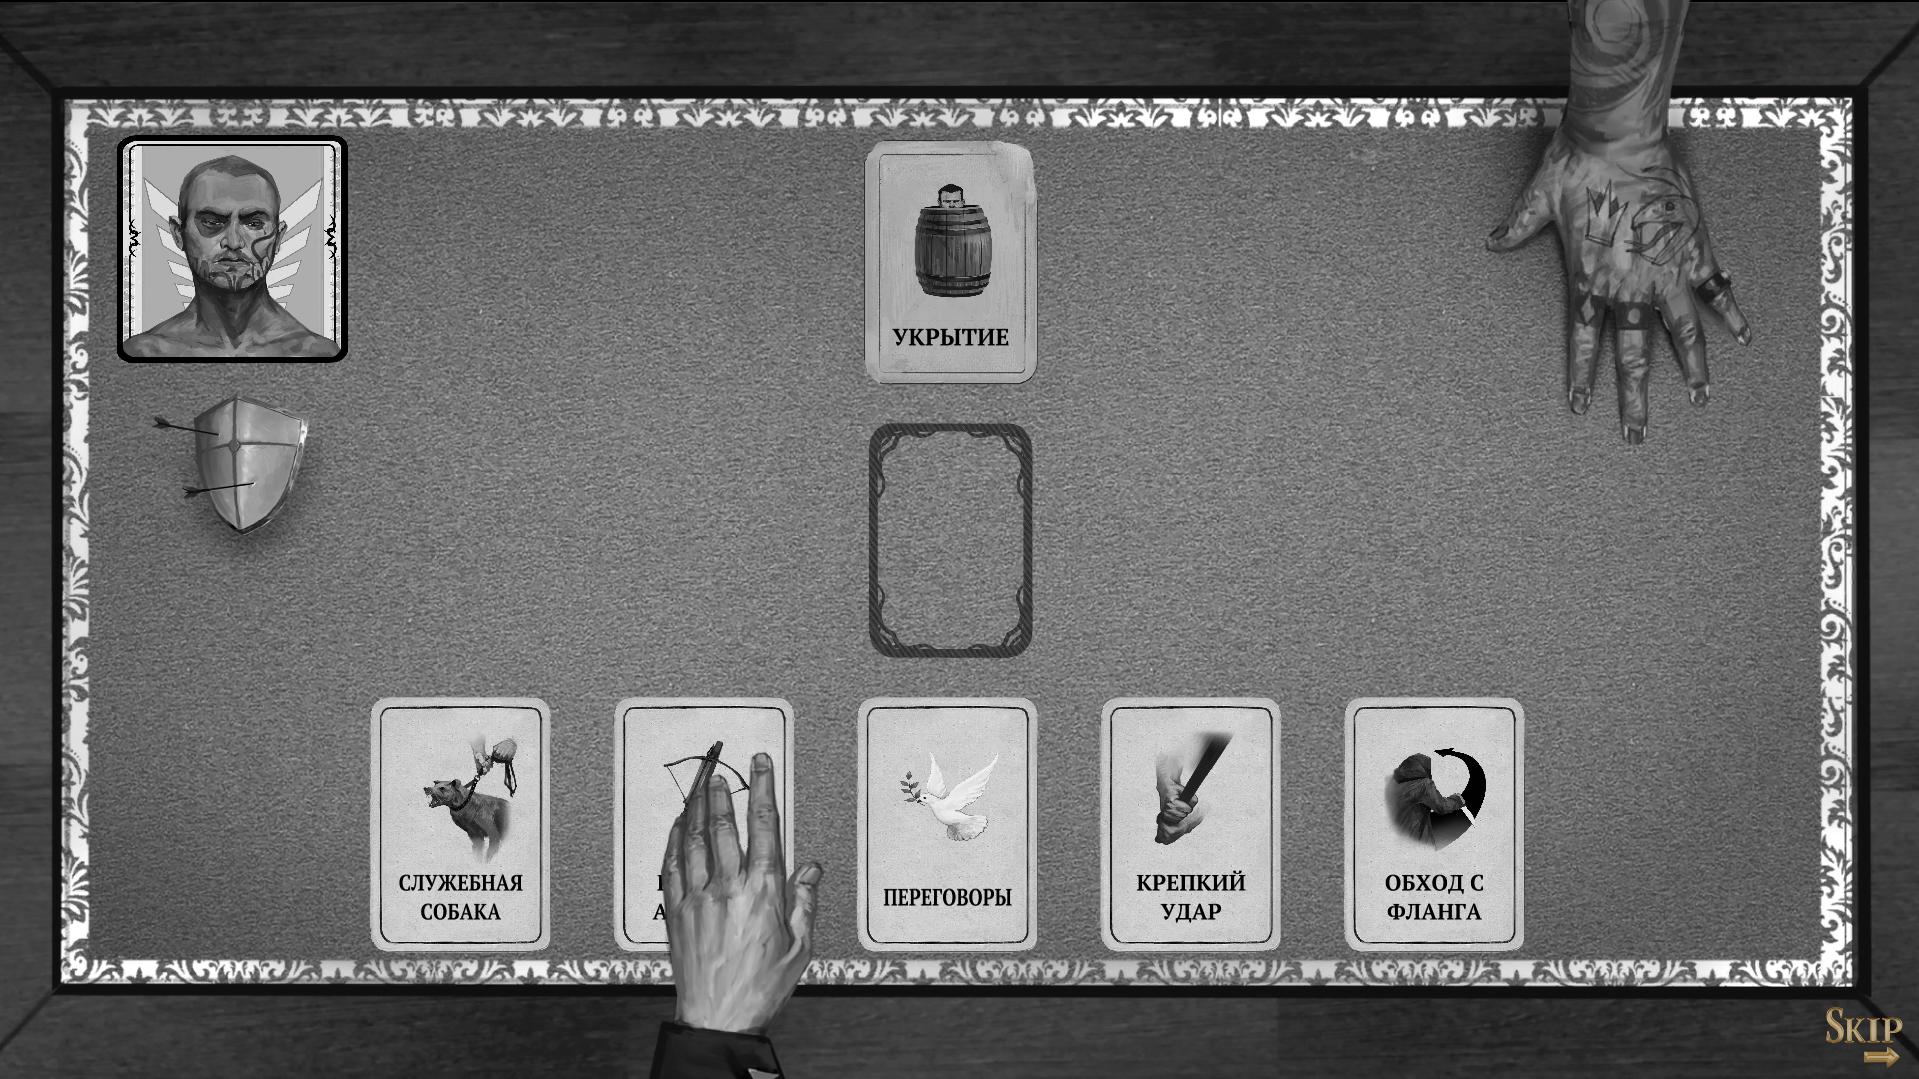 Стол ККИ. Project Pastorate — Обзор - Project Pastorate — Игровые обзоры — DevTribe: Разработка игр (ProjectPastorate, инди-игры, Куратор, Обзор)